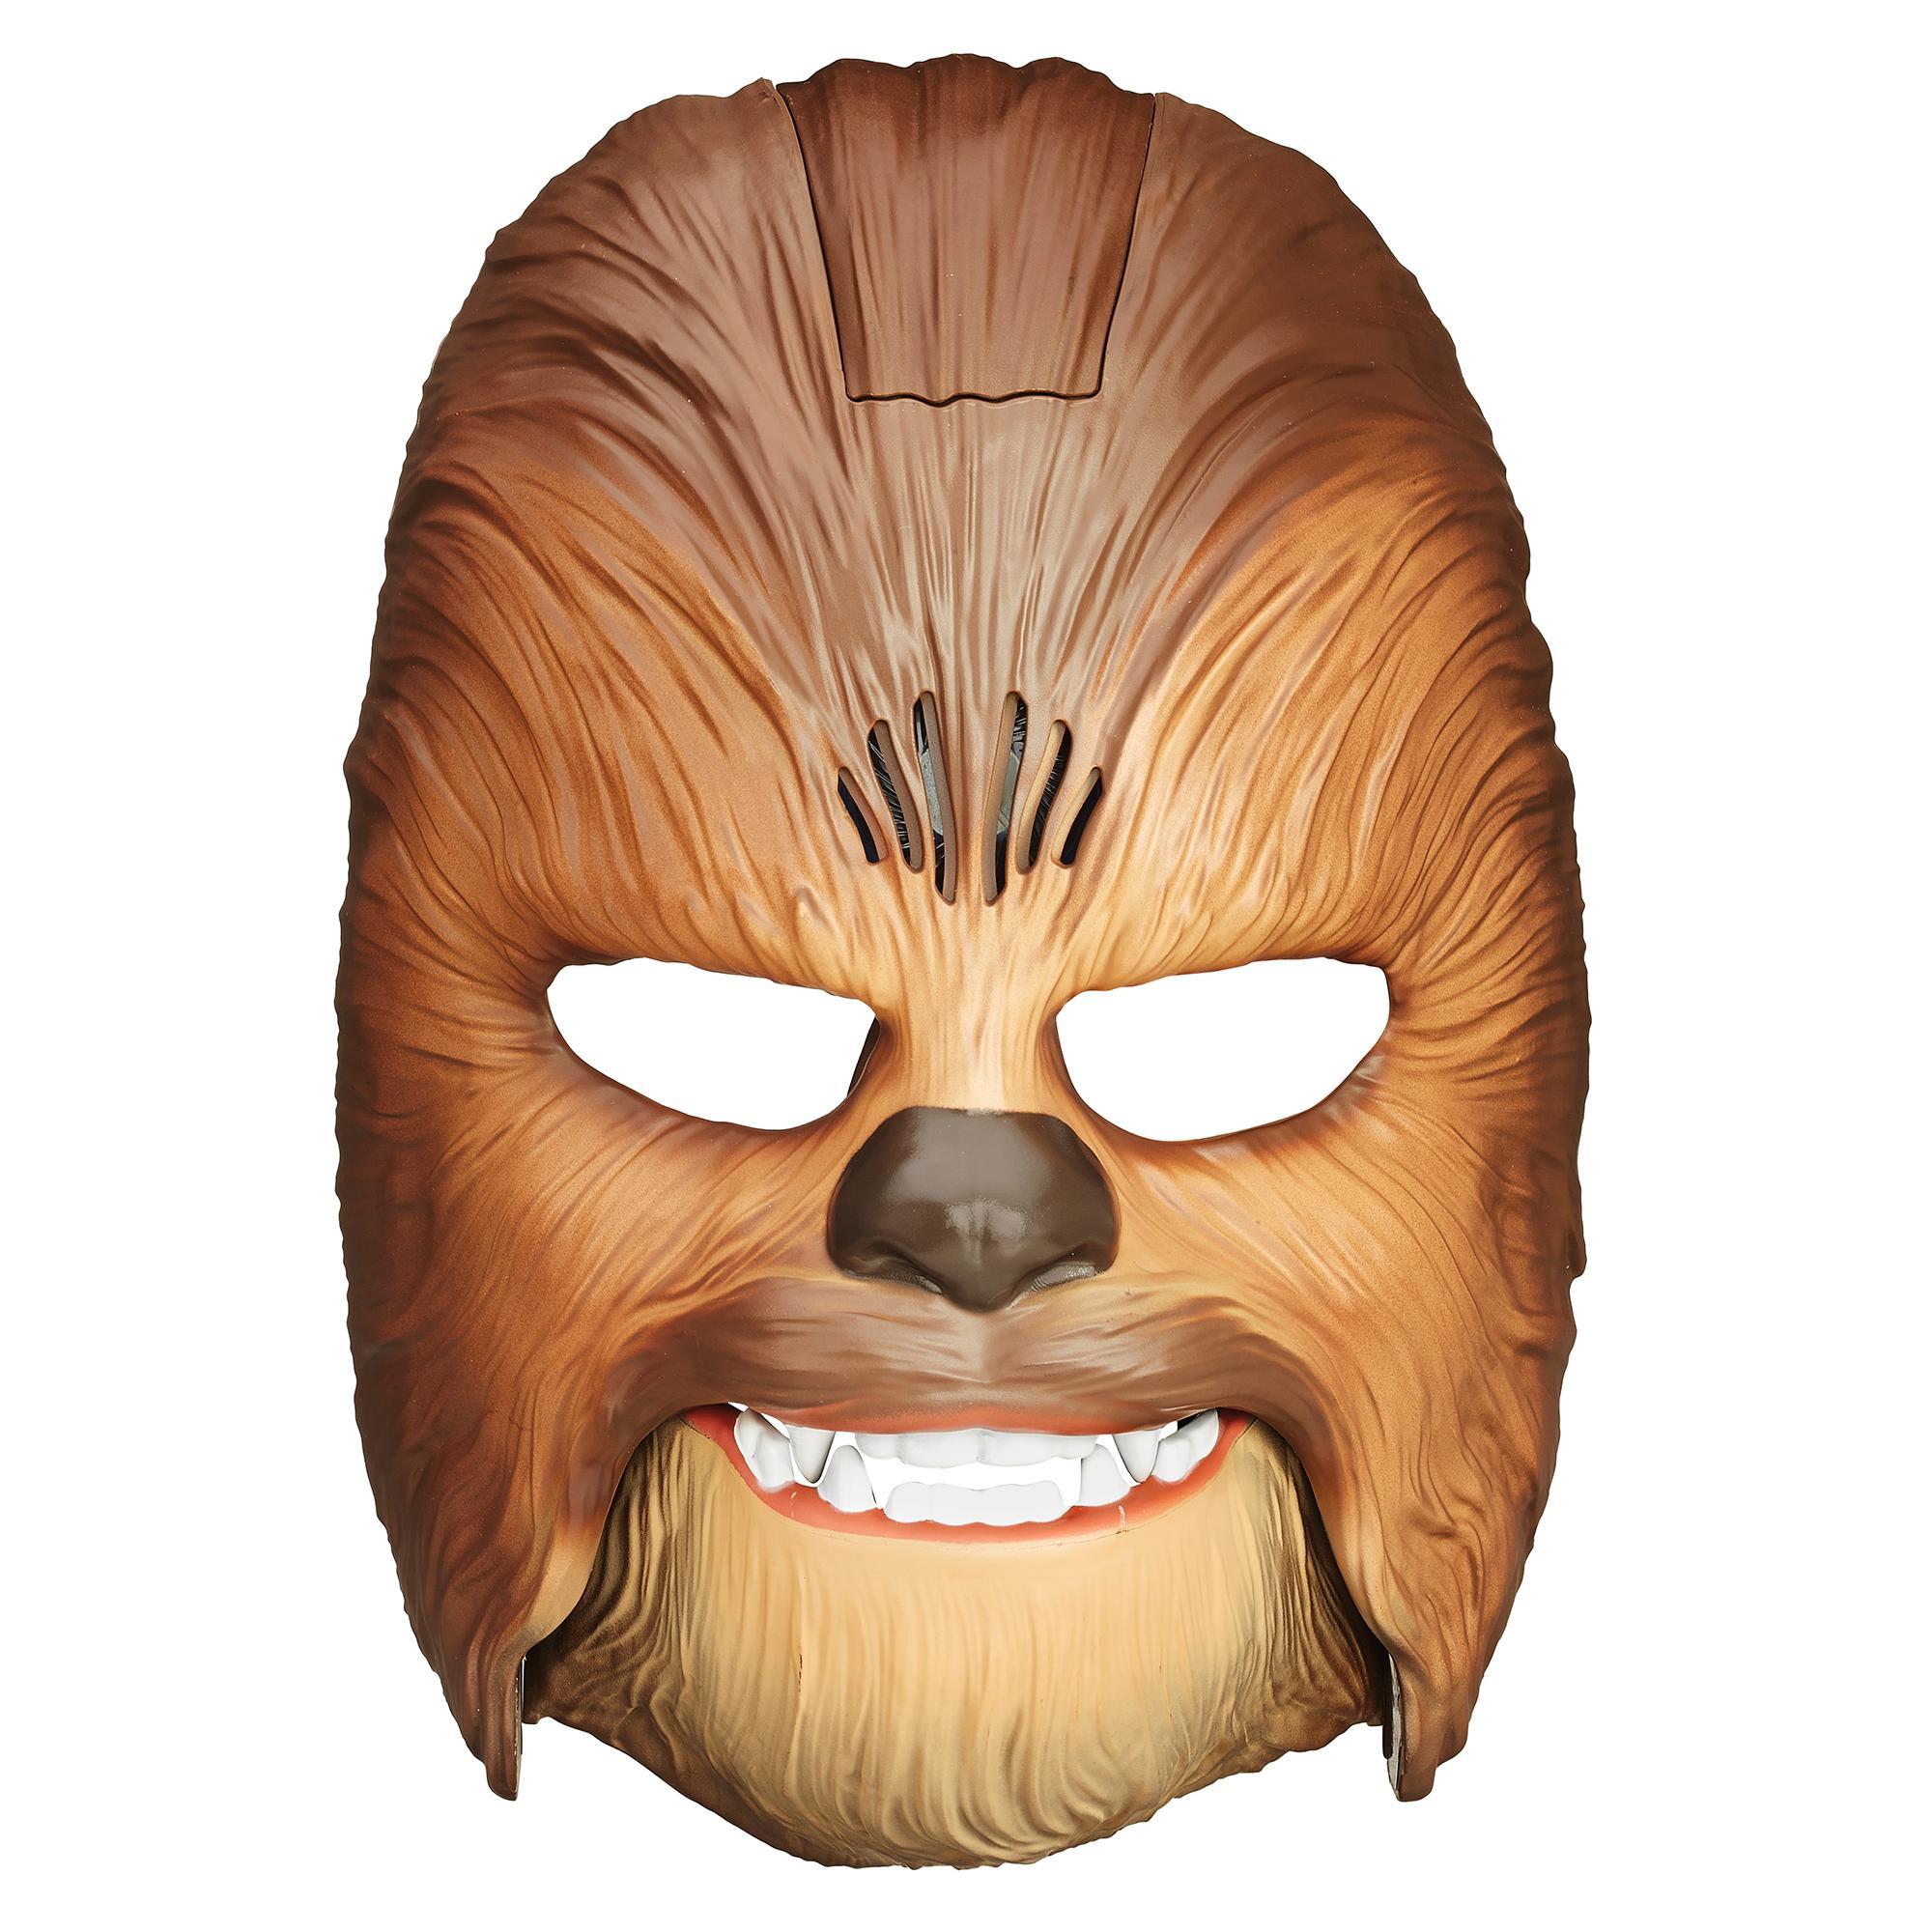 Star Wars The Force Awakens Chewbacca Elektronisk mask